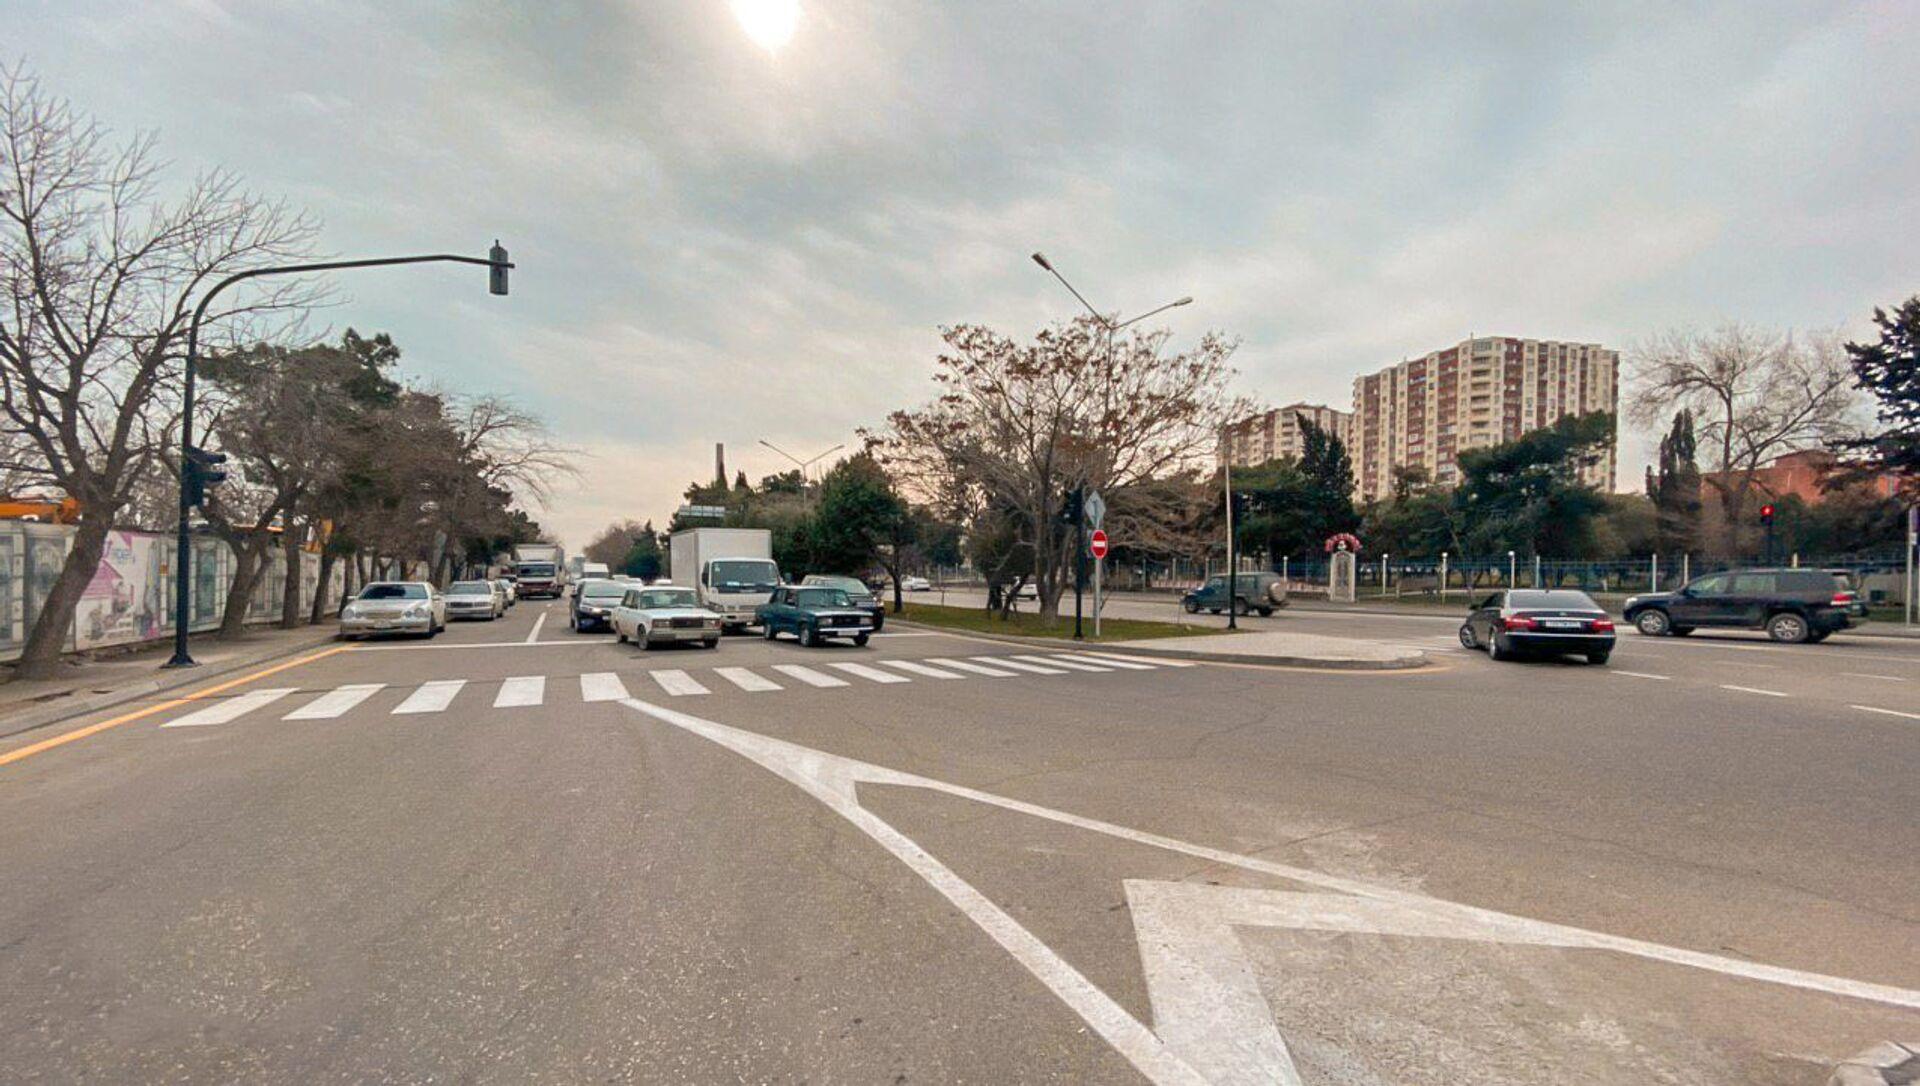 Новый светофор на улицах Ахмада Раджабли и Джафара Хандана  - Sputnik Азербайджан, 1920, 22.09.2021